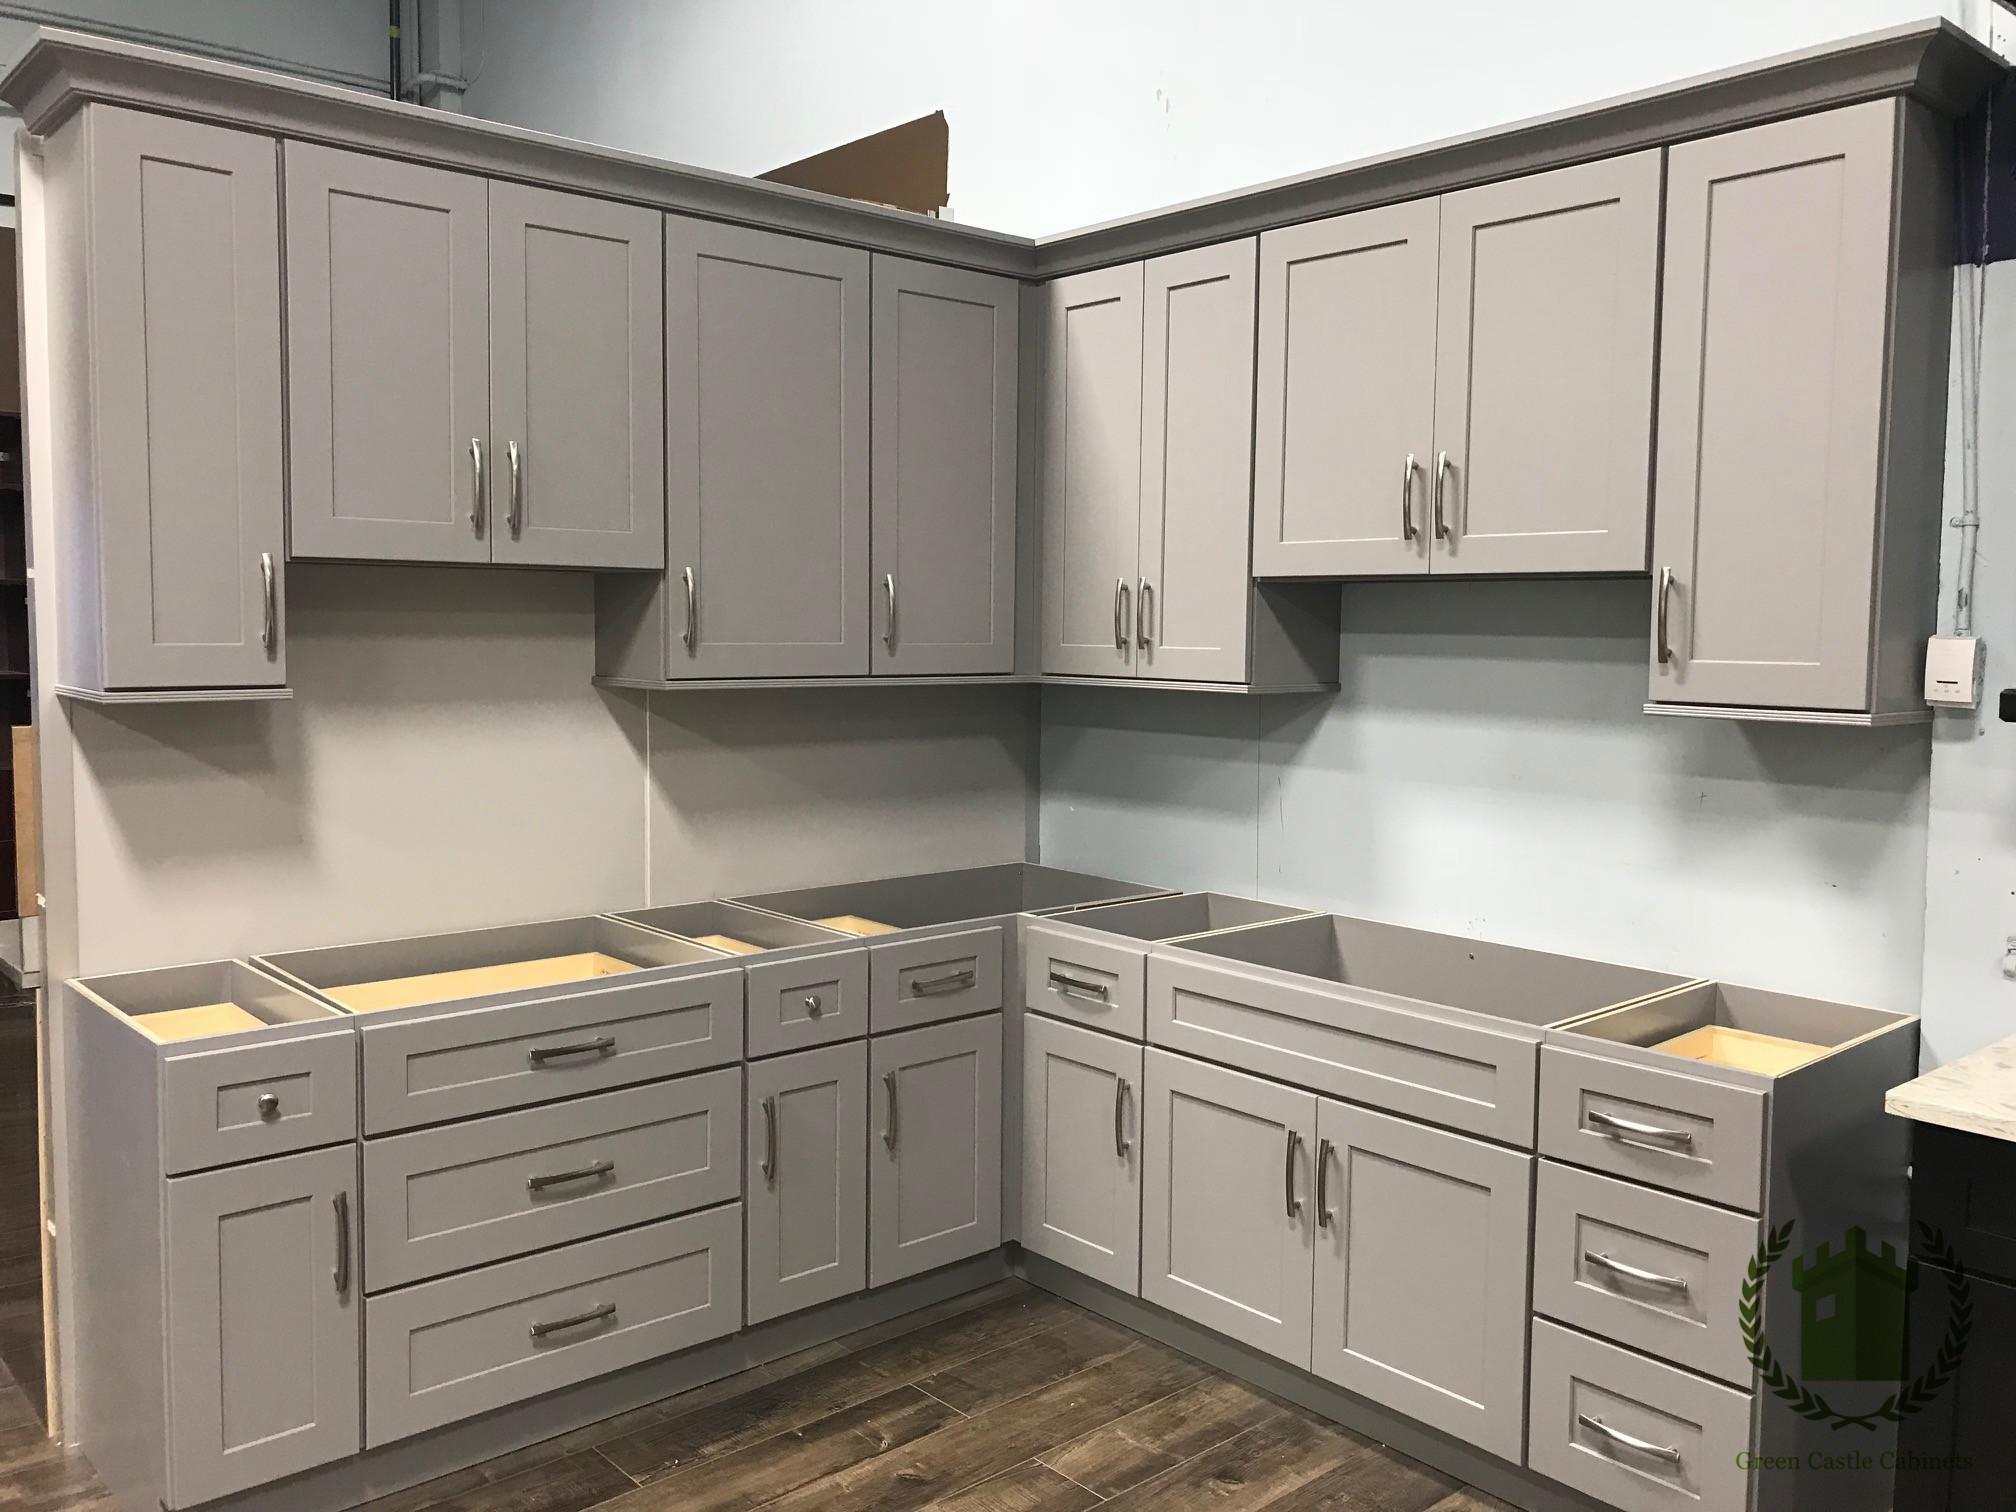 style kitchen open cabinets craft modern an cabinetry european elan in design